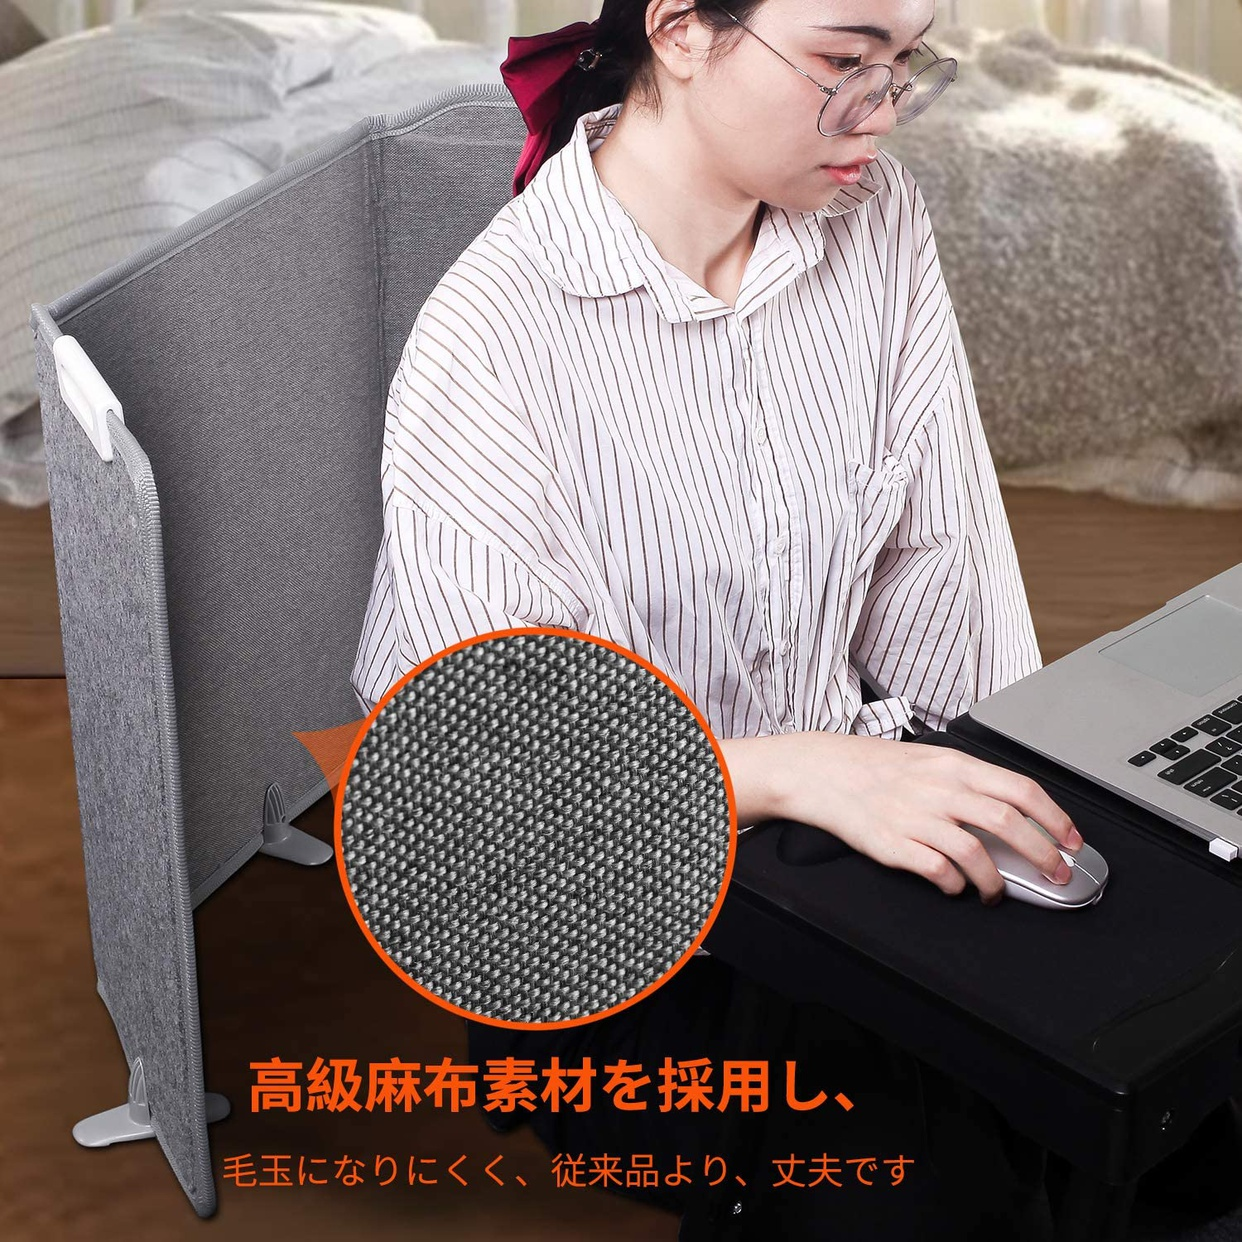 GENERAL ARMOR(ジェネラルアーマー) デスクヒーターの商品画像3